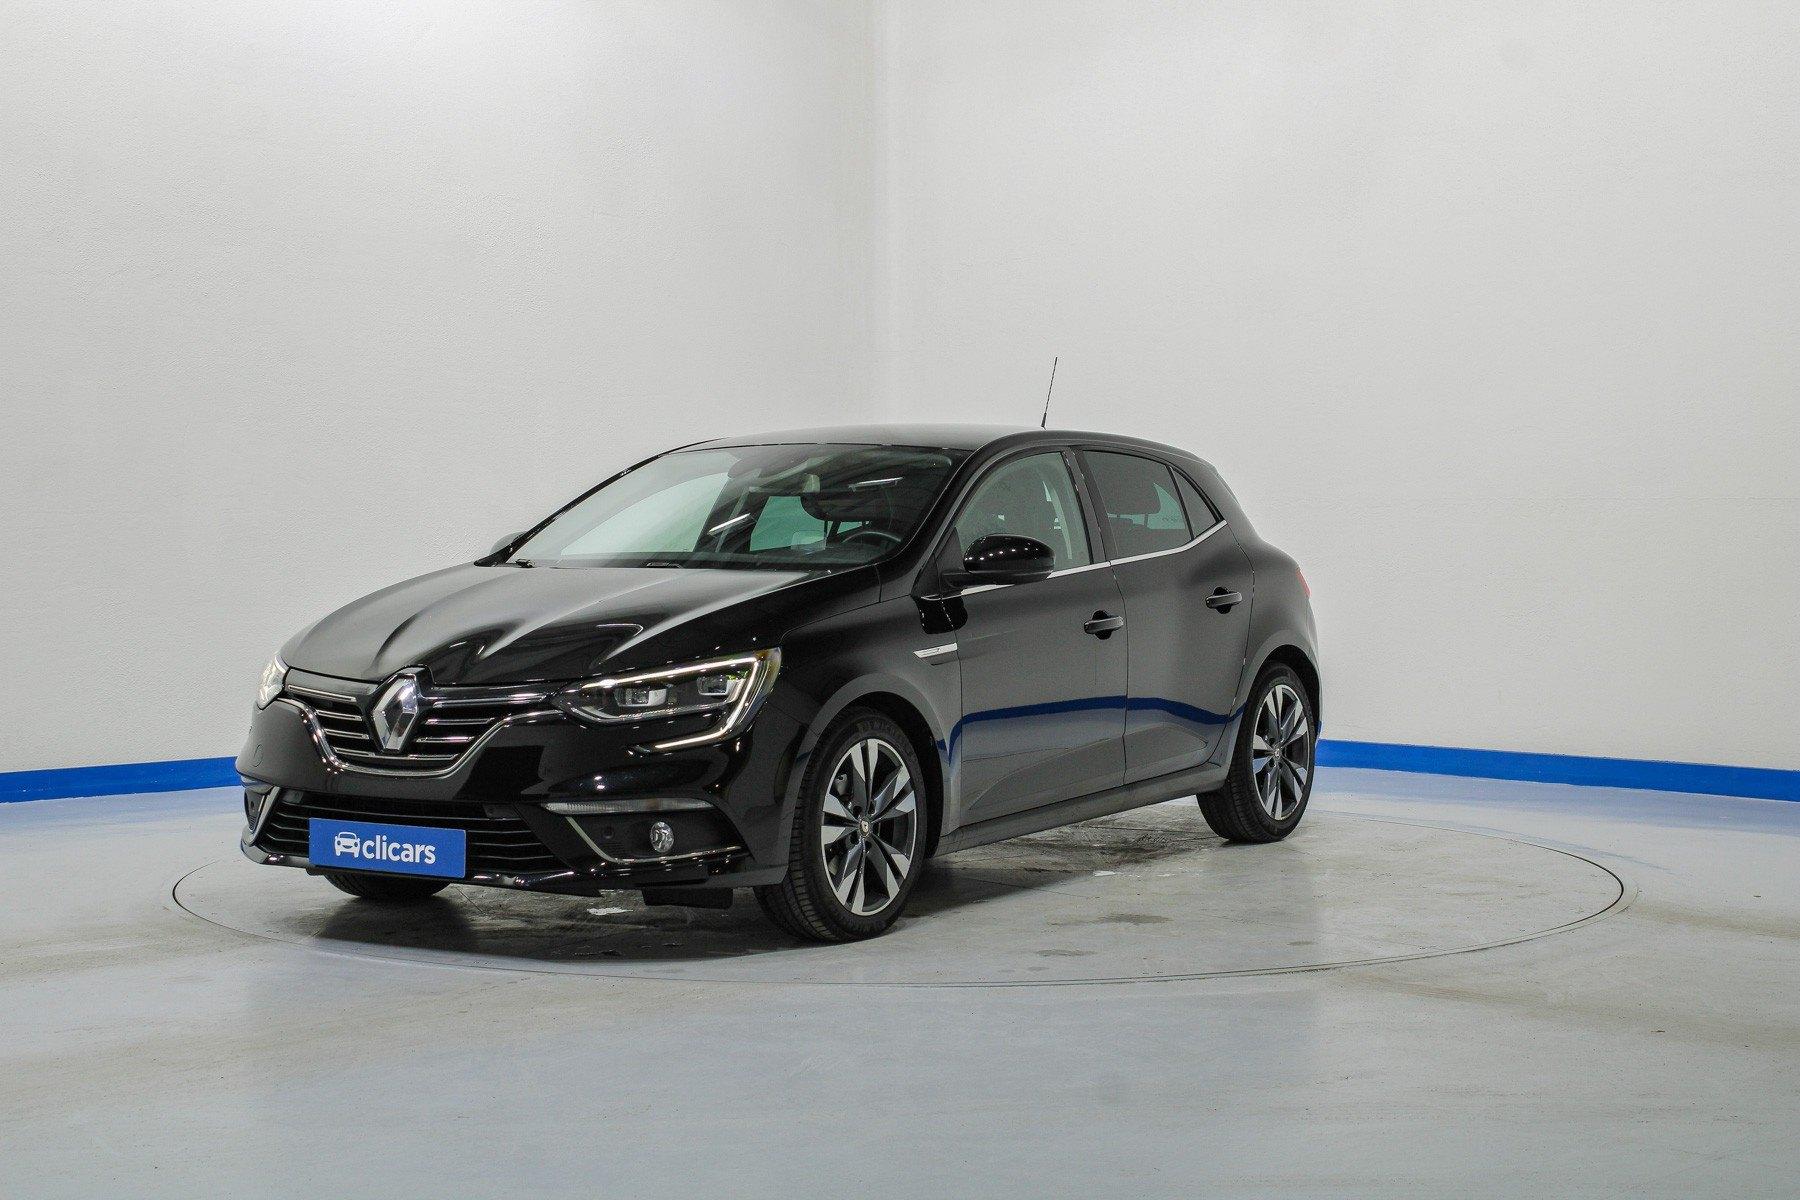 Renault Mégane Diésel Business Blue dCi 81 kW (115CV) 1